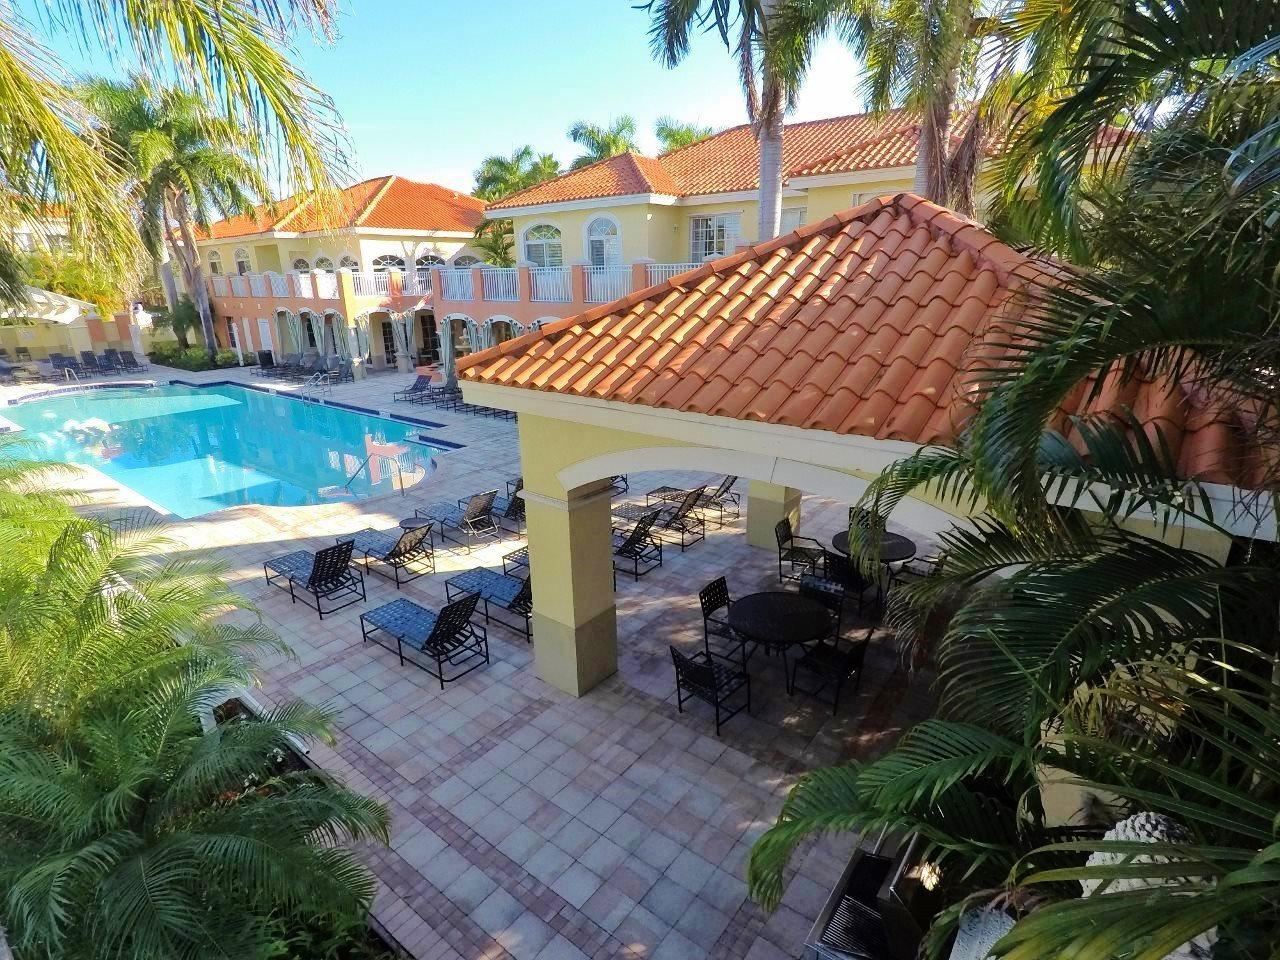 11016 Legacy Drive 103, Palm Beach Gardens, Florida 33410, 1 Bedroom Bedrooms, ,1 BathroomBathrooms,F,Condominium,Legacy,RX-10717446